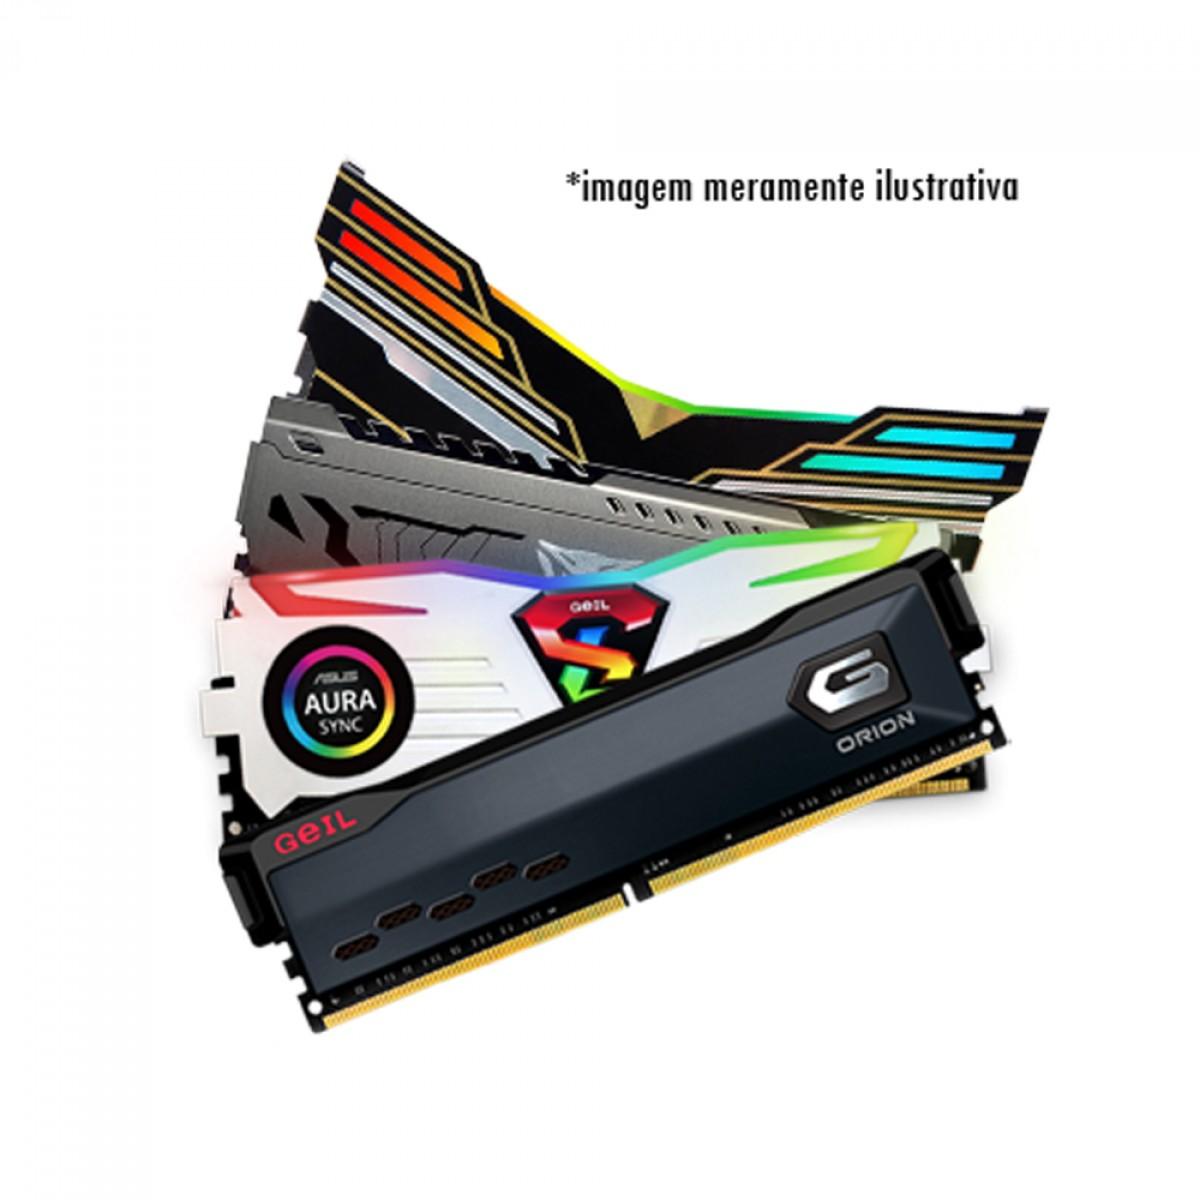 Kit Upgrade, AMD Ryzen 5 PRO 4650G + Asus TUF GAMING B450M-PLUS II + 8GB DDR4 3000MHz